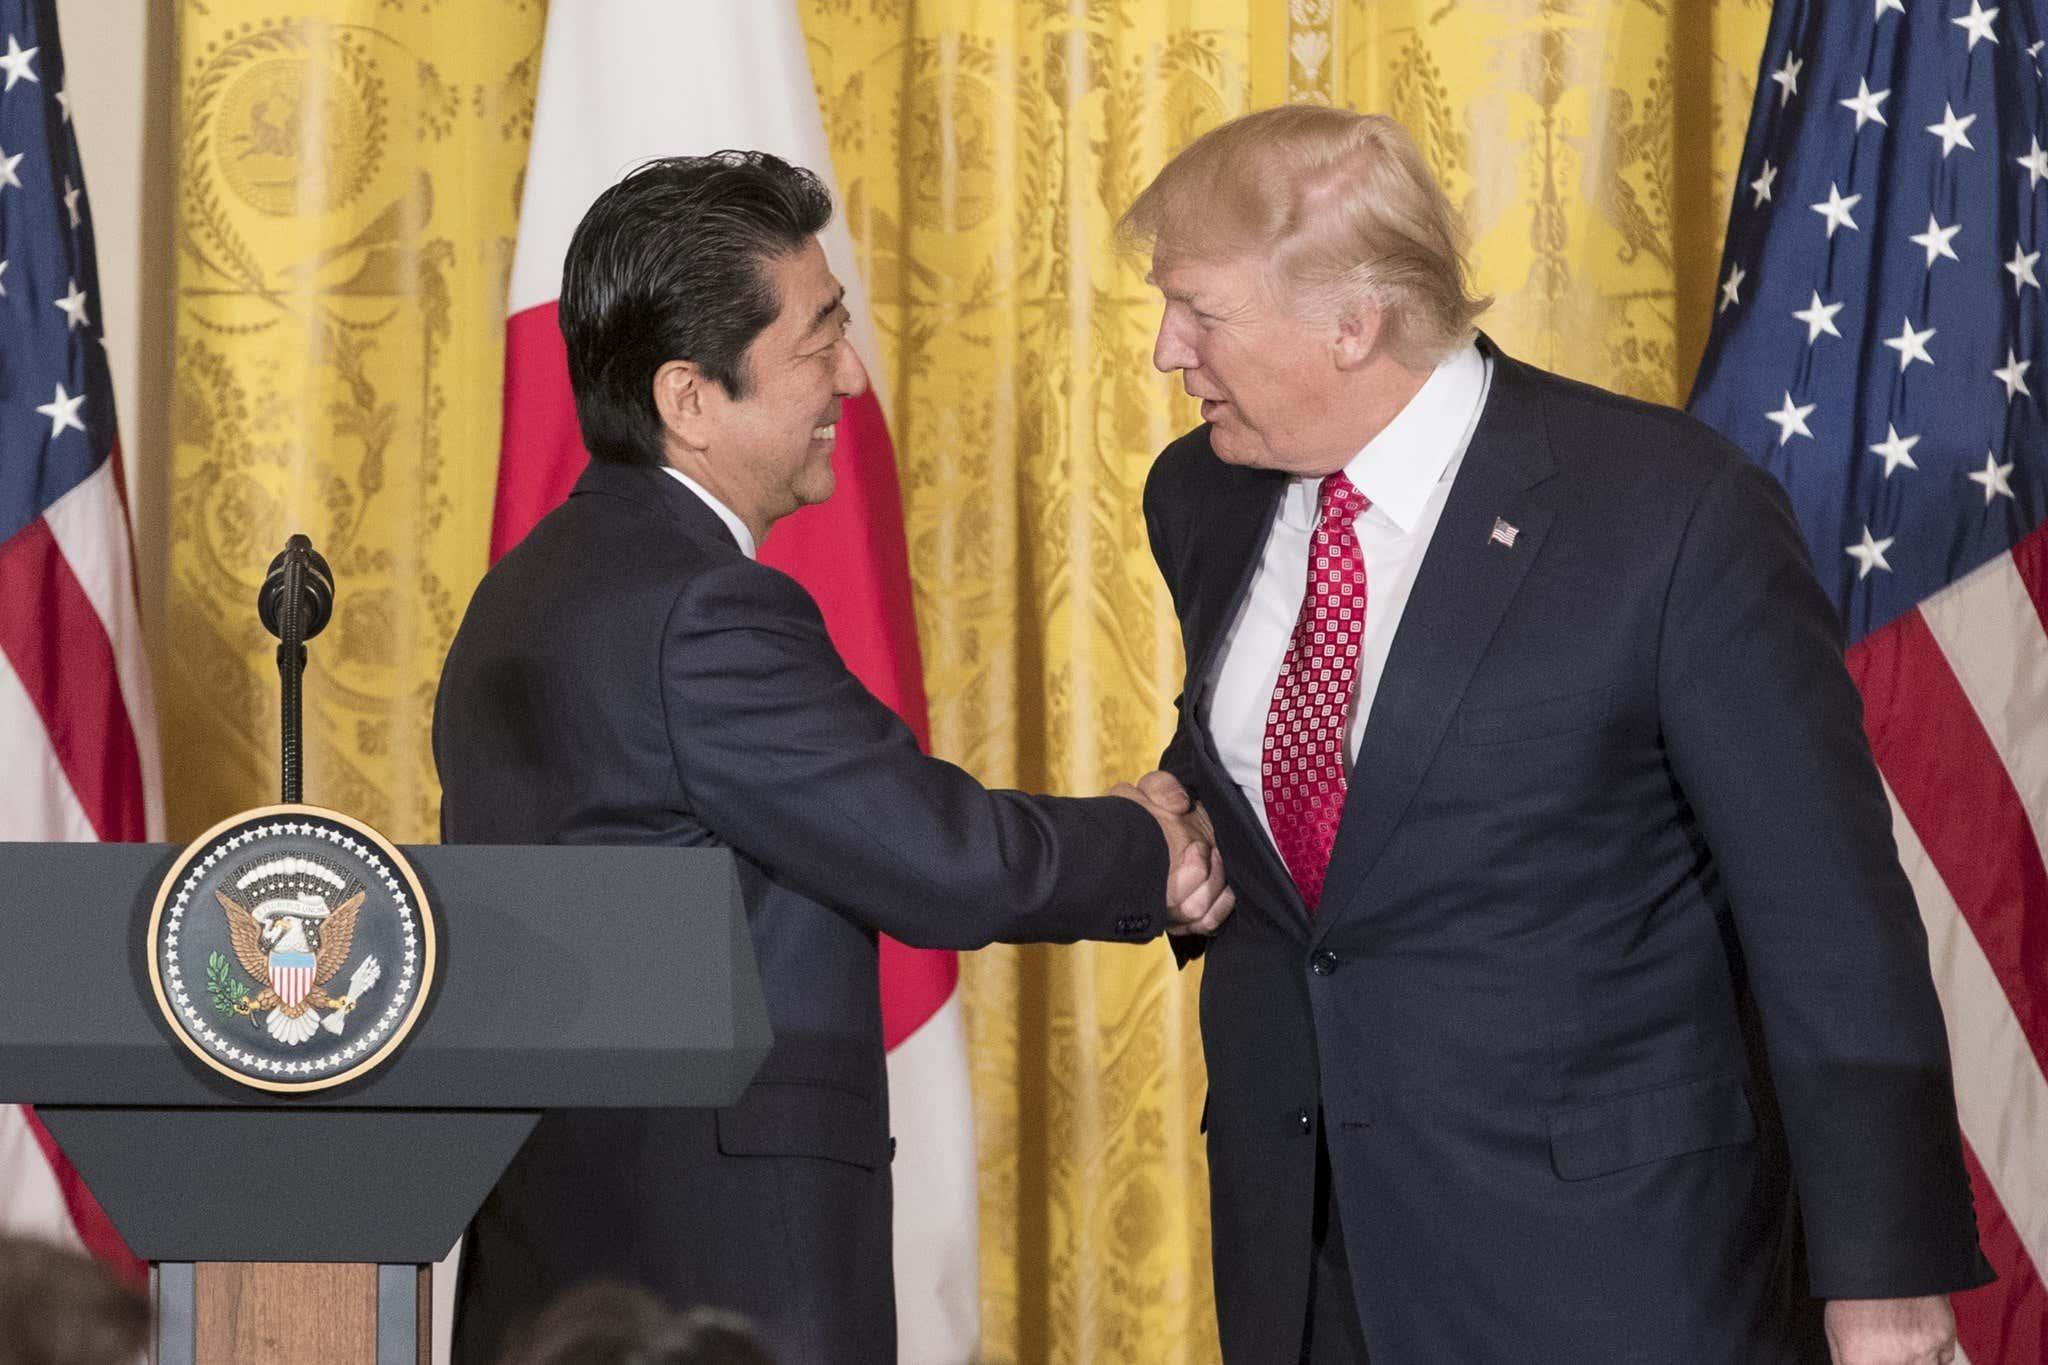 ct-donald-trump-handshakes-arm-pull-20170216